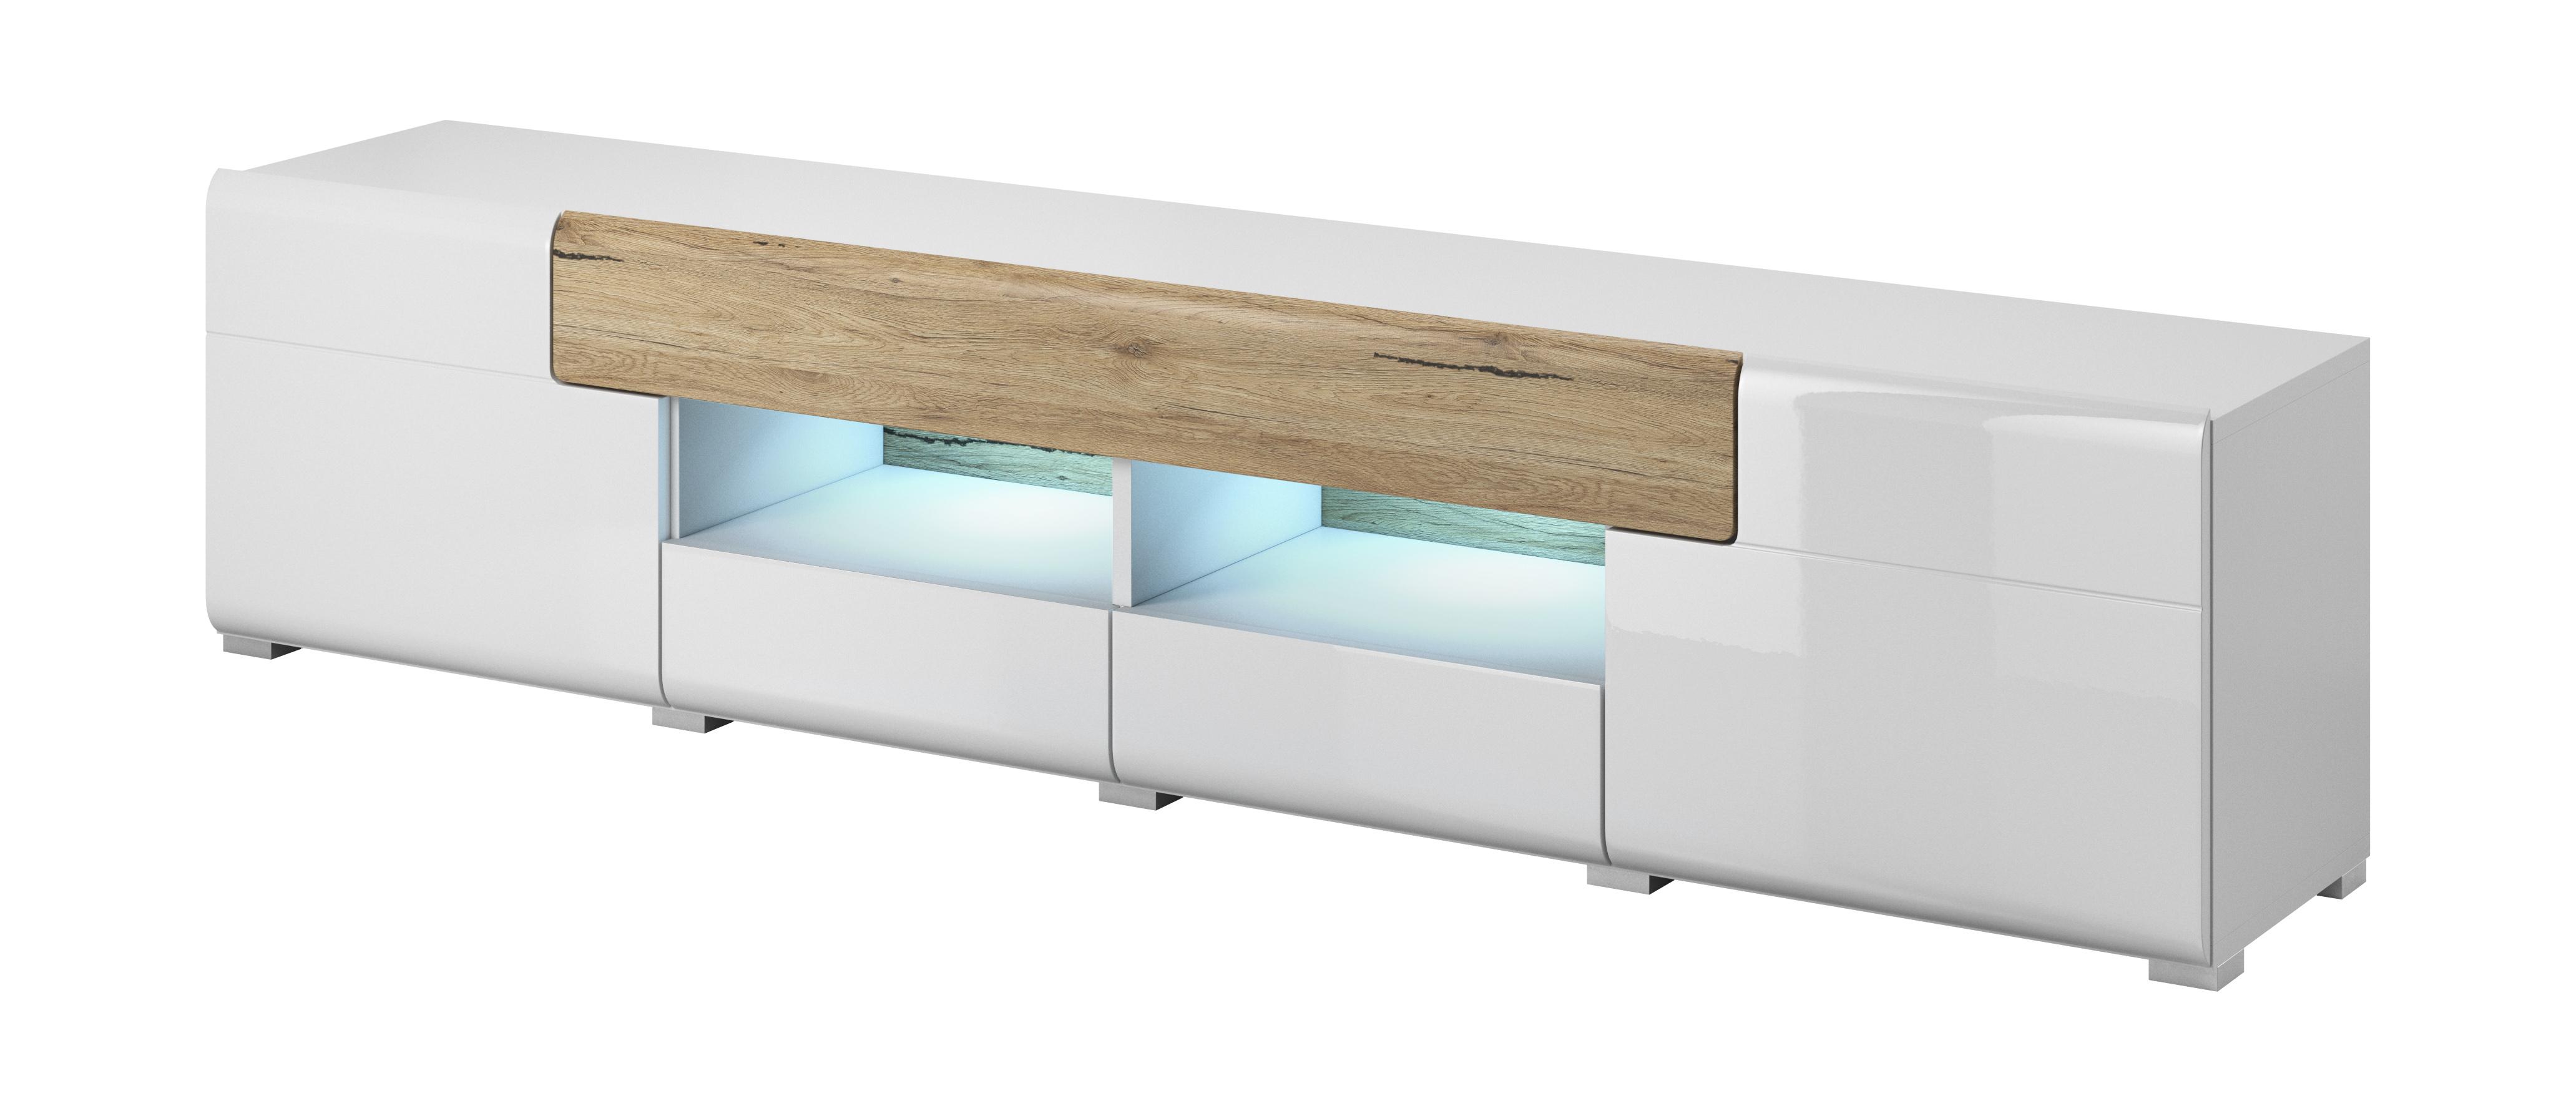 TV stolík/skrinka Terence Typ 40